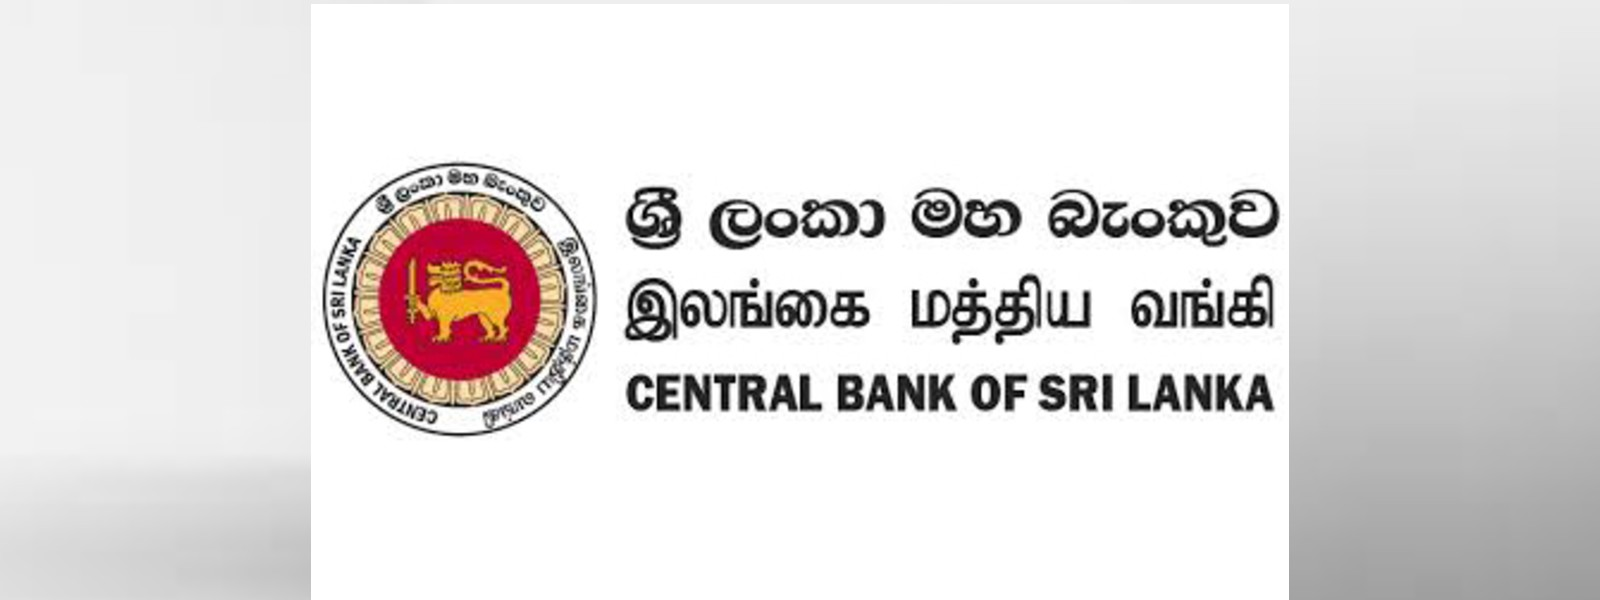 Foreign investors return to Sri Lankan bonds after 4-months